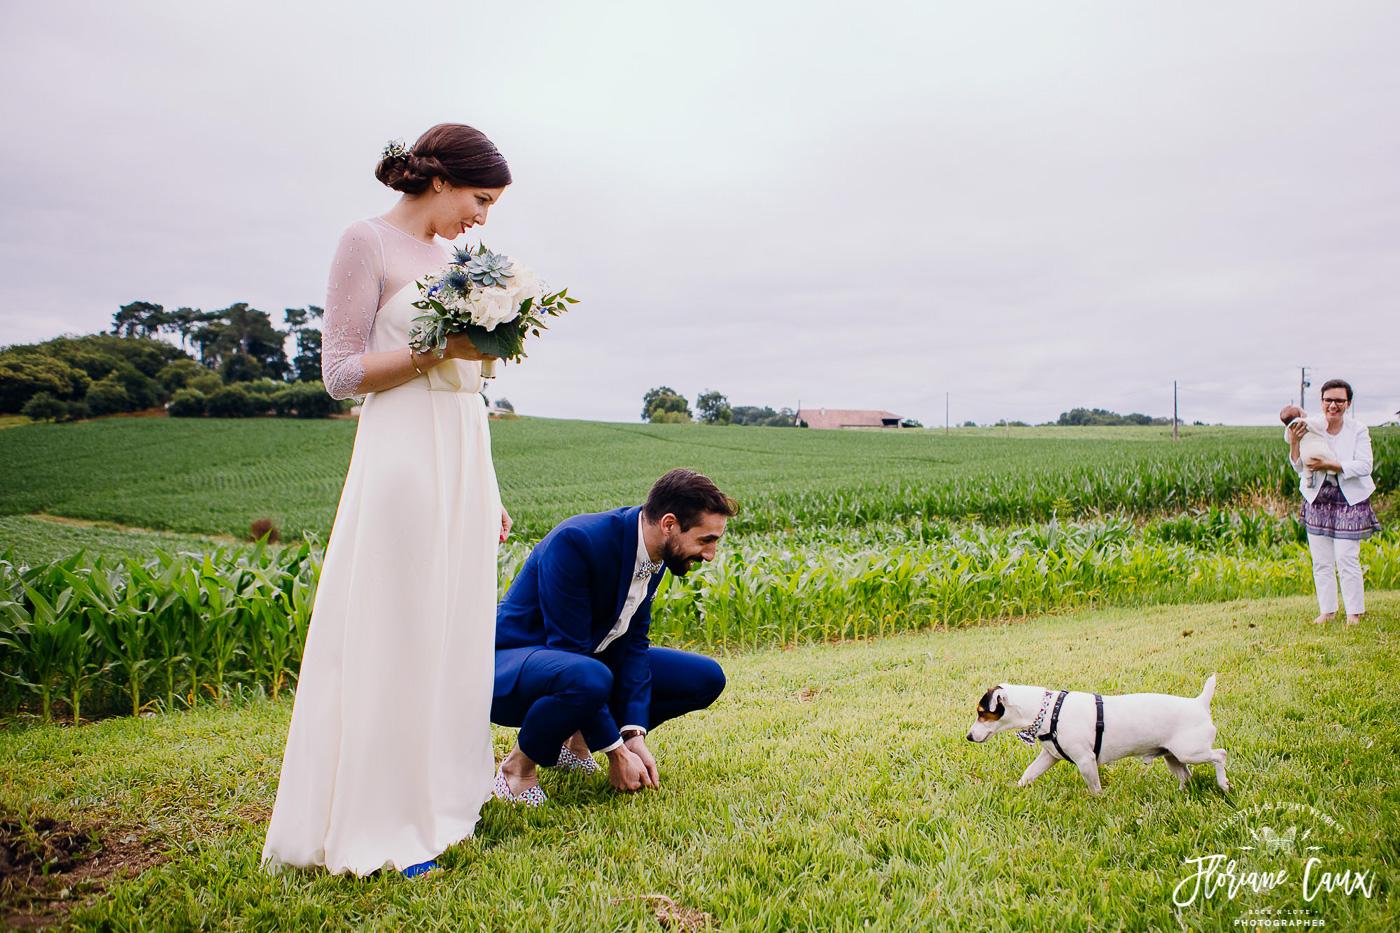 photographe-mariage-pays-basque-Floriane-Caux (31)